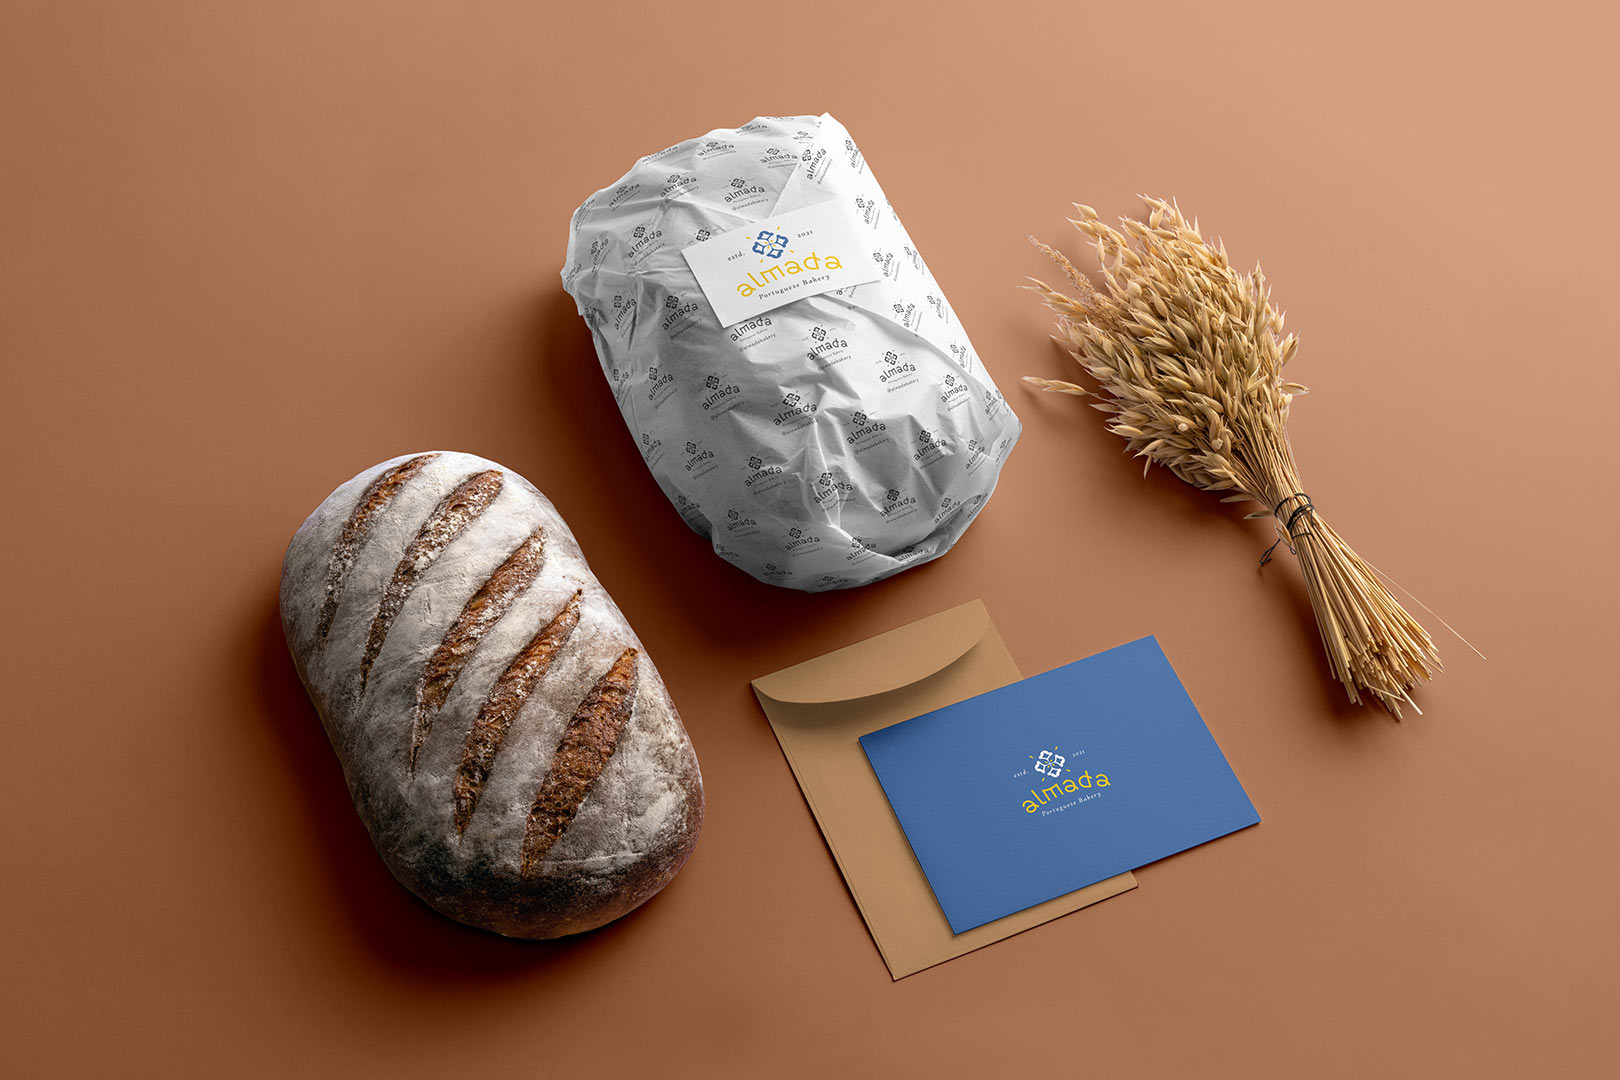 001-almada-bakery-branding-01